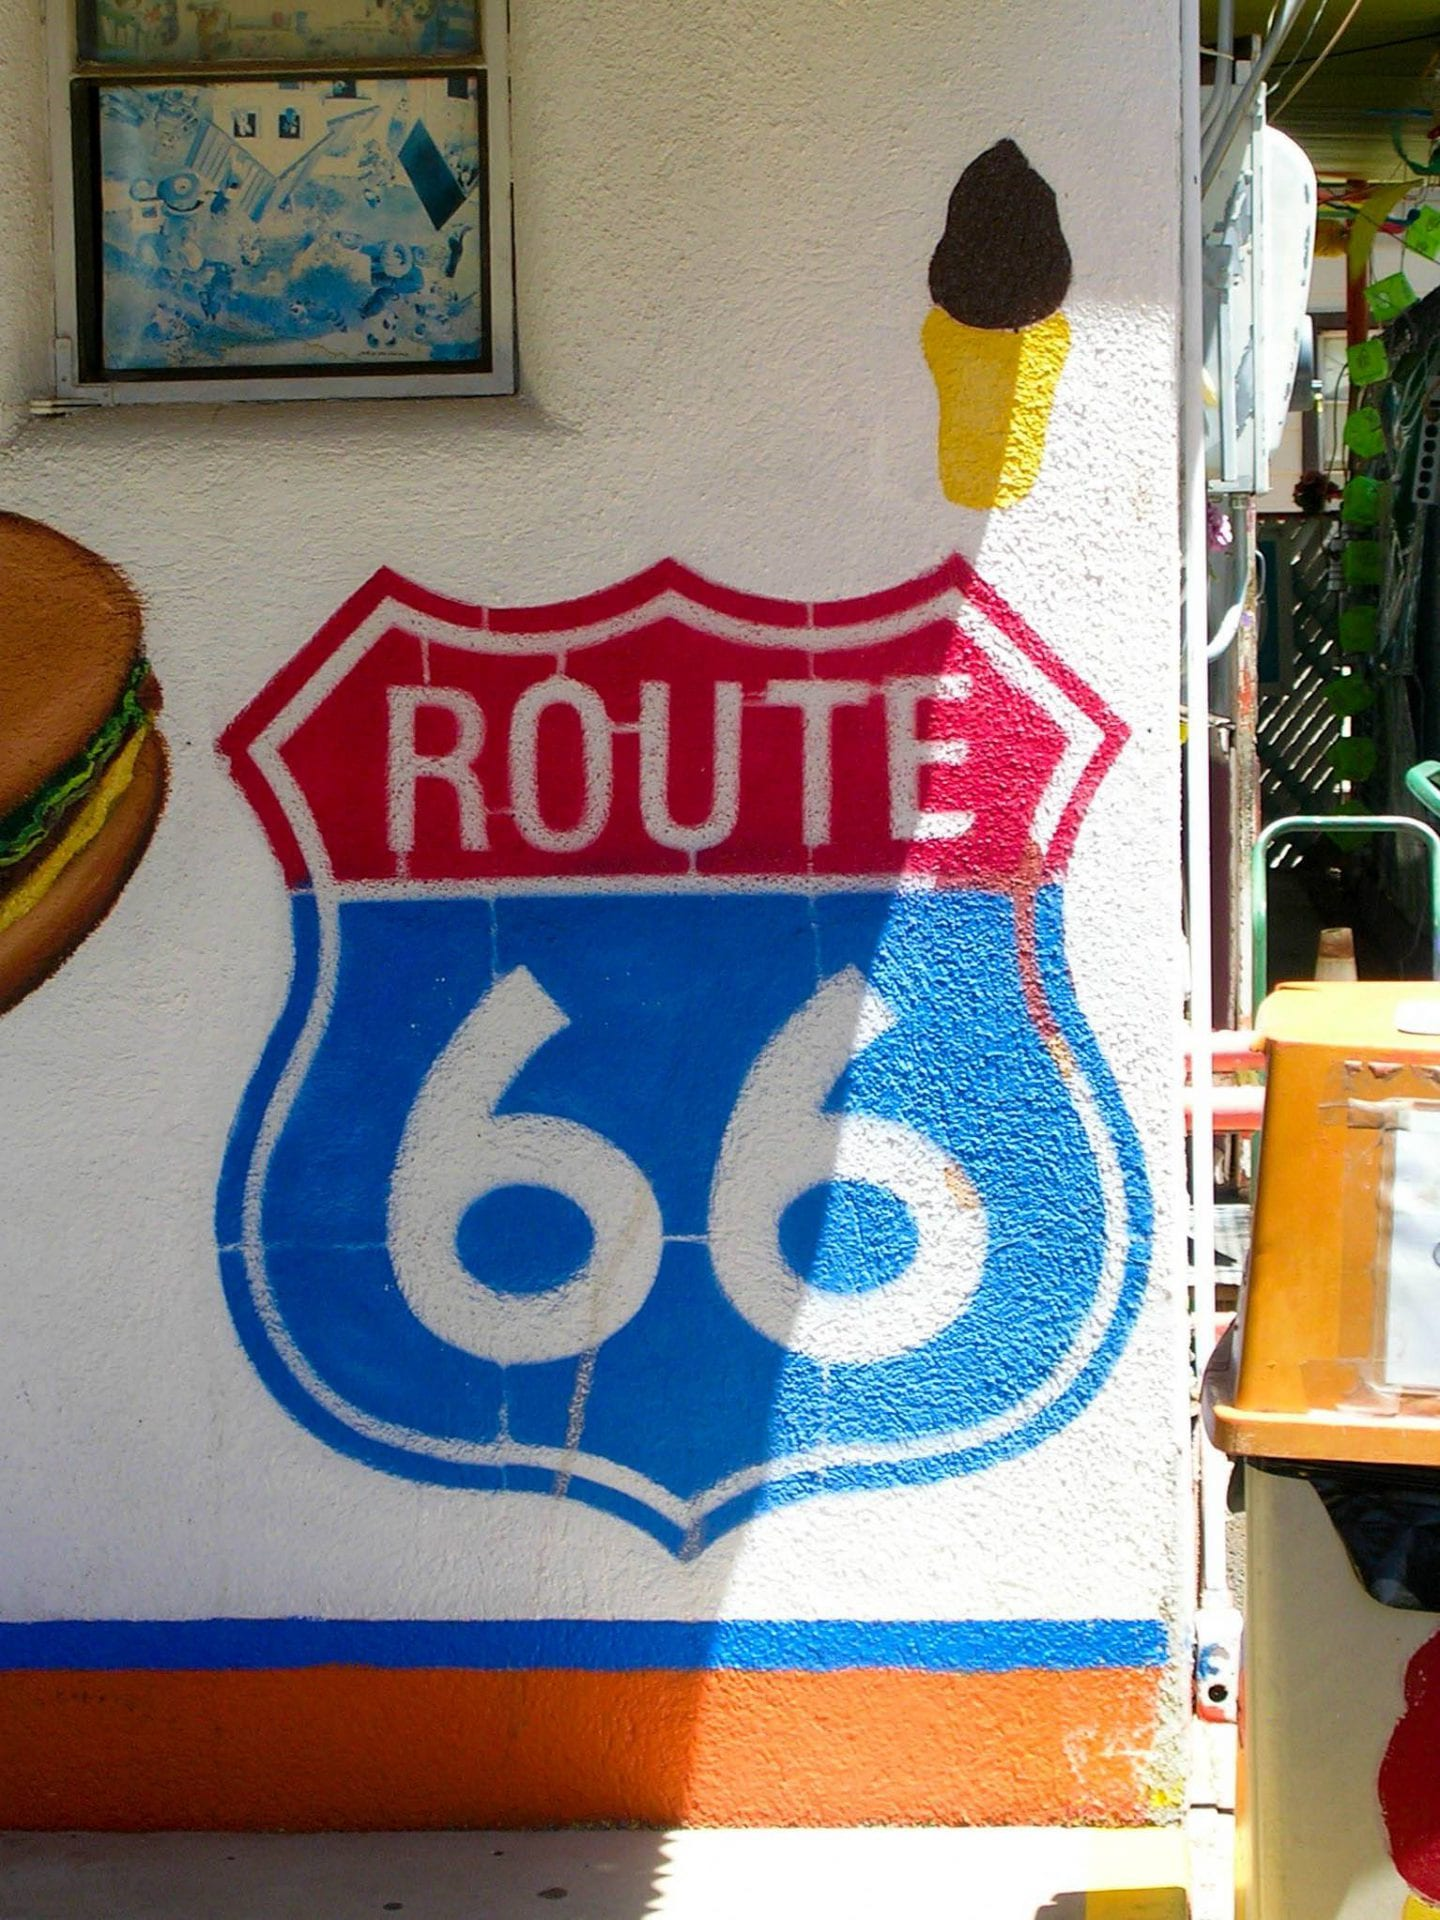 My Big Fat American Road Trip